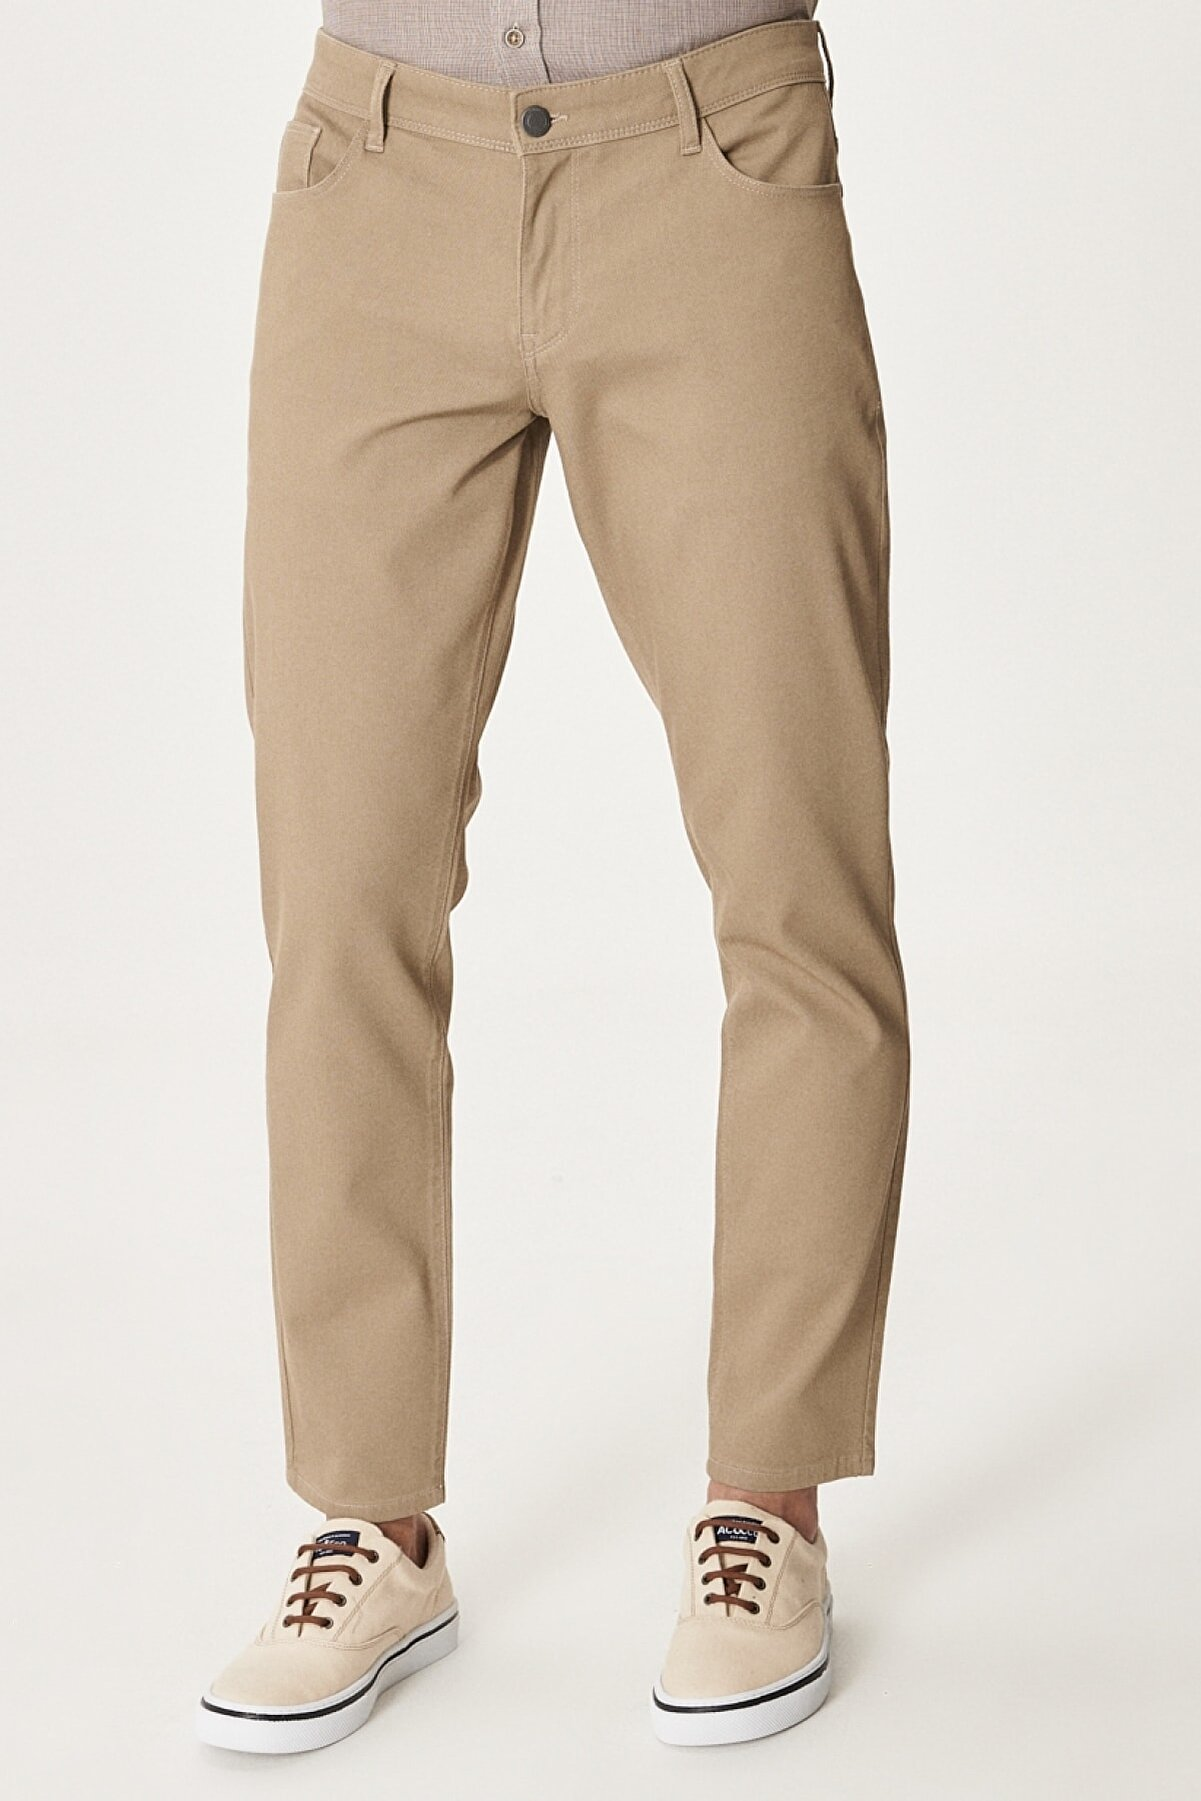 Altınyıldız Classics Erkek Vizon Kanvas Slim Fit Dar Kesim 5 Cep Pantolon